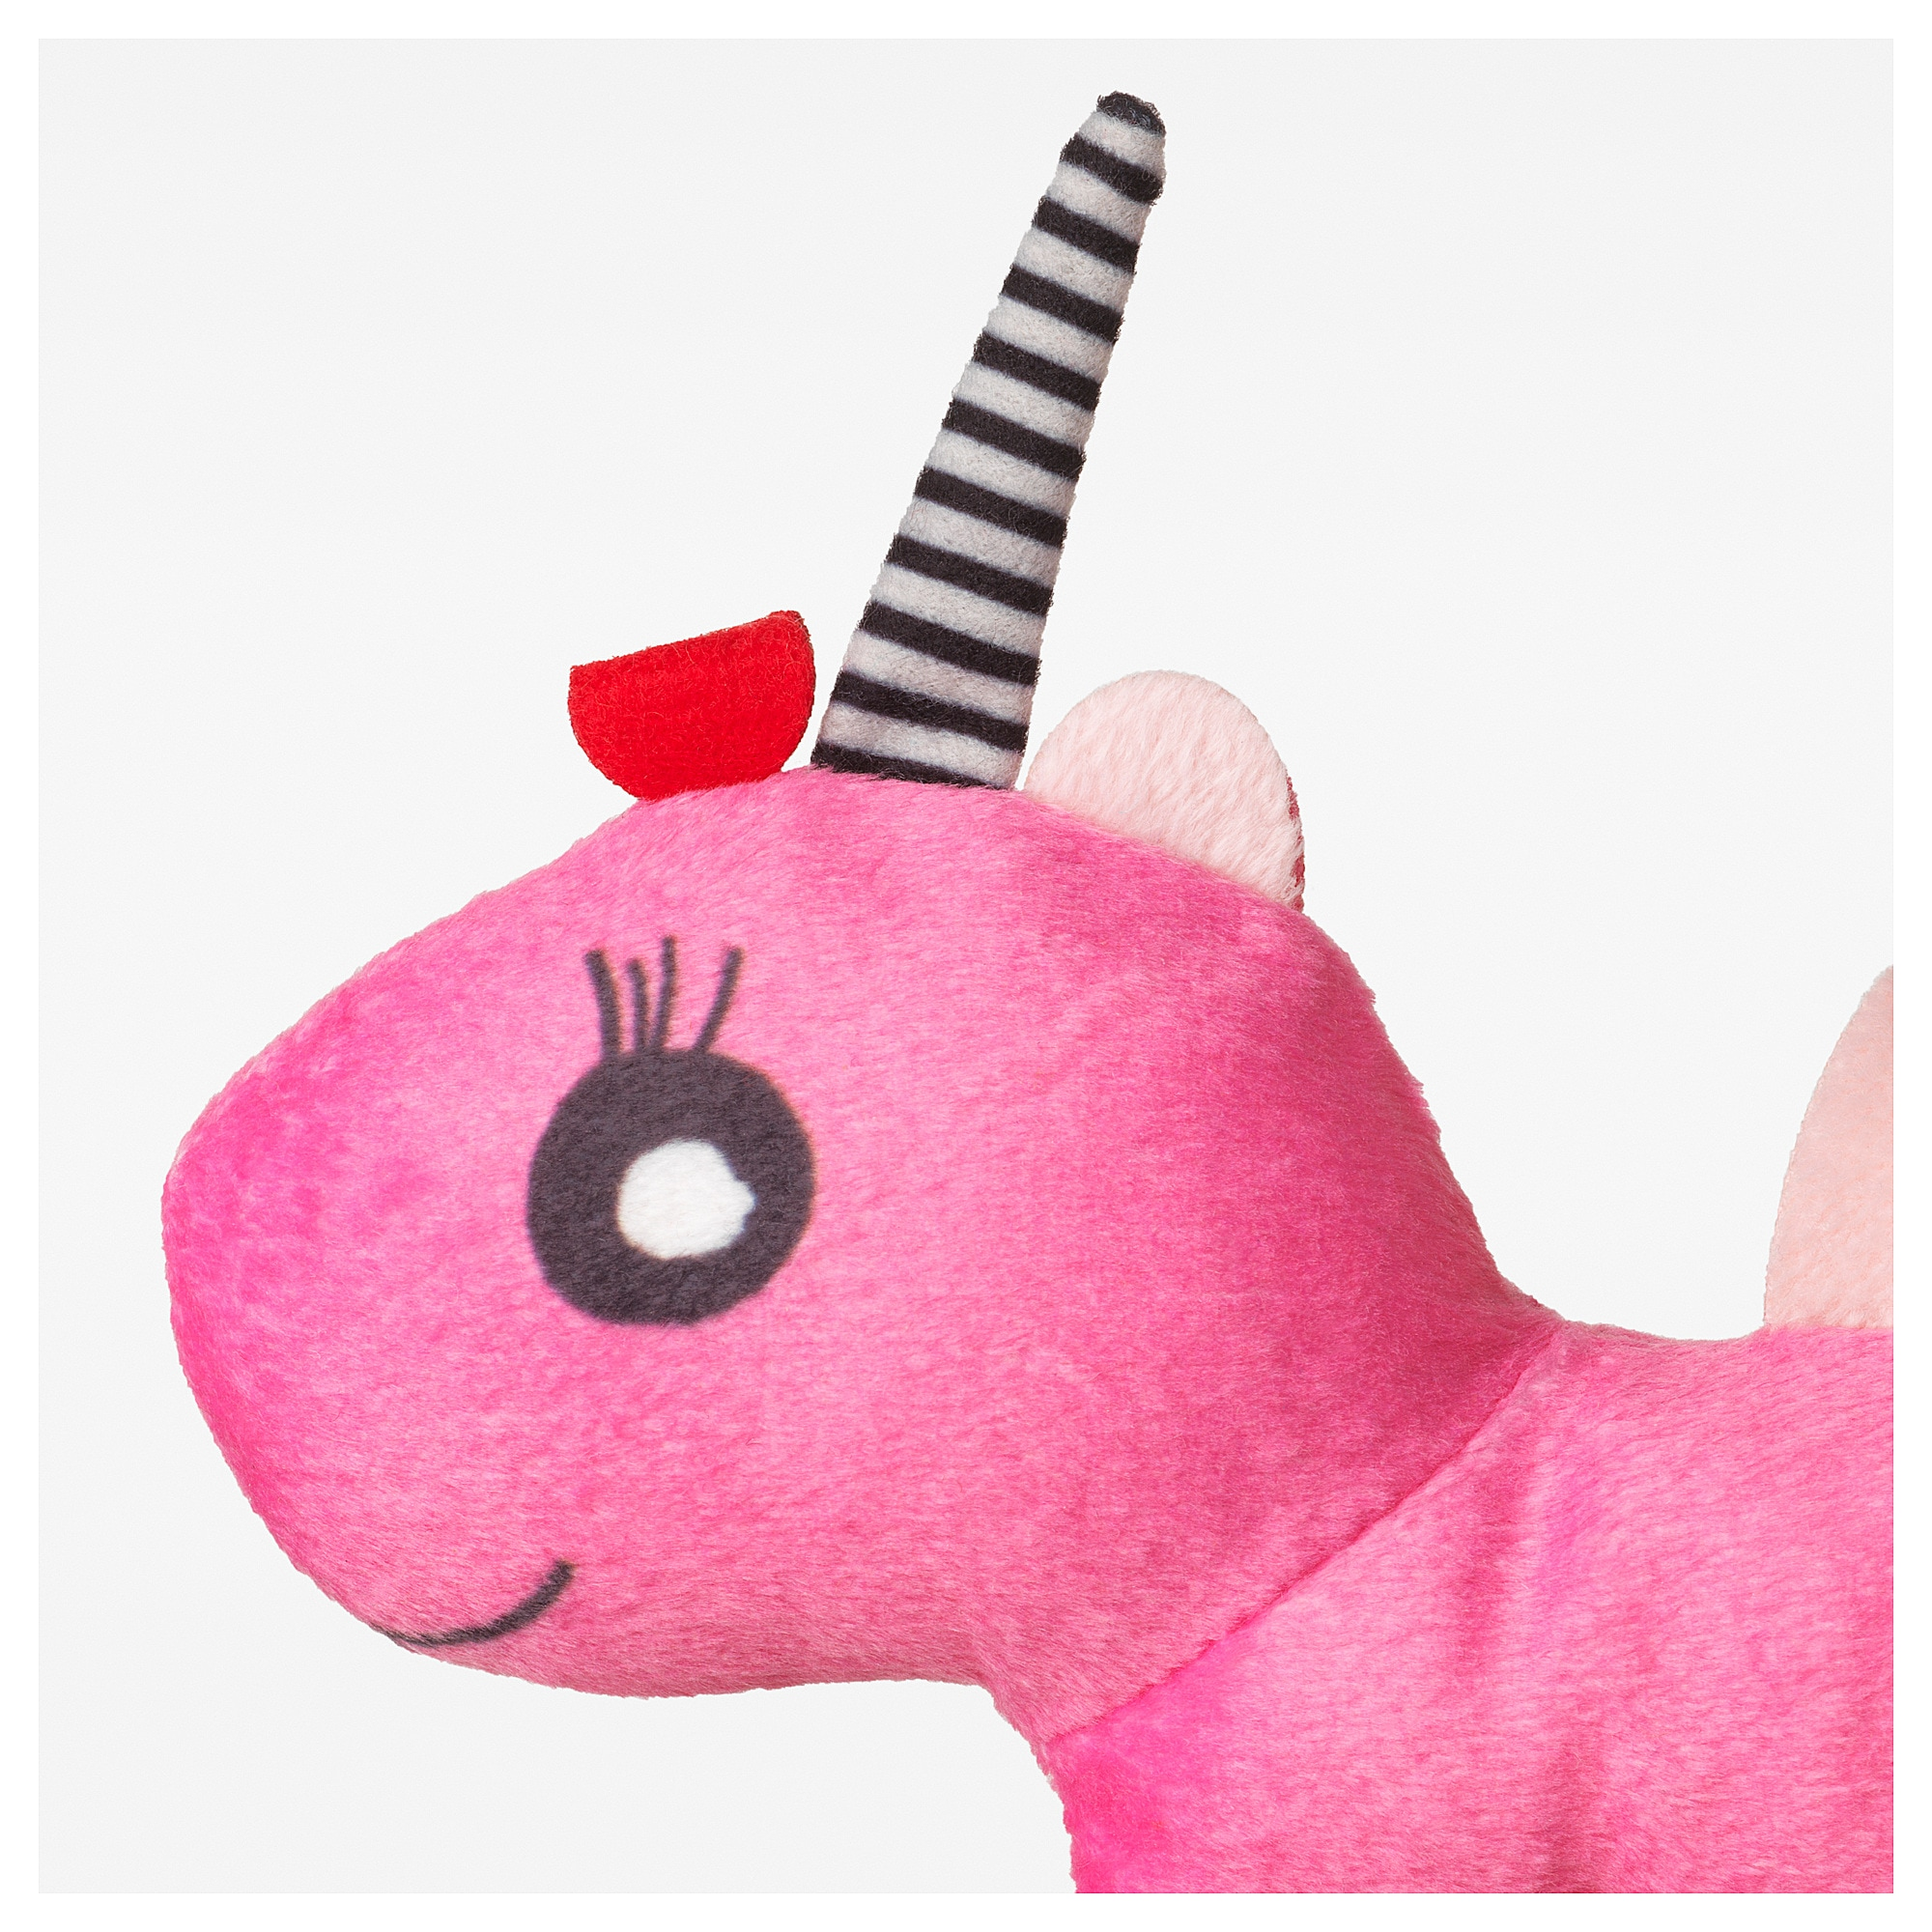 Мягкая игрушка САГОСКАТТ артикуль № 004.093.72 в наличии. Онлайн каталог IKEA Минск. Недорогая доставка и монтаж.